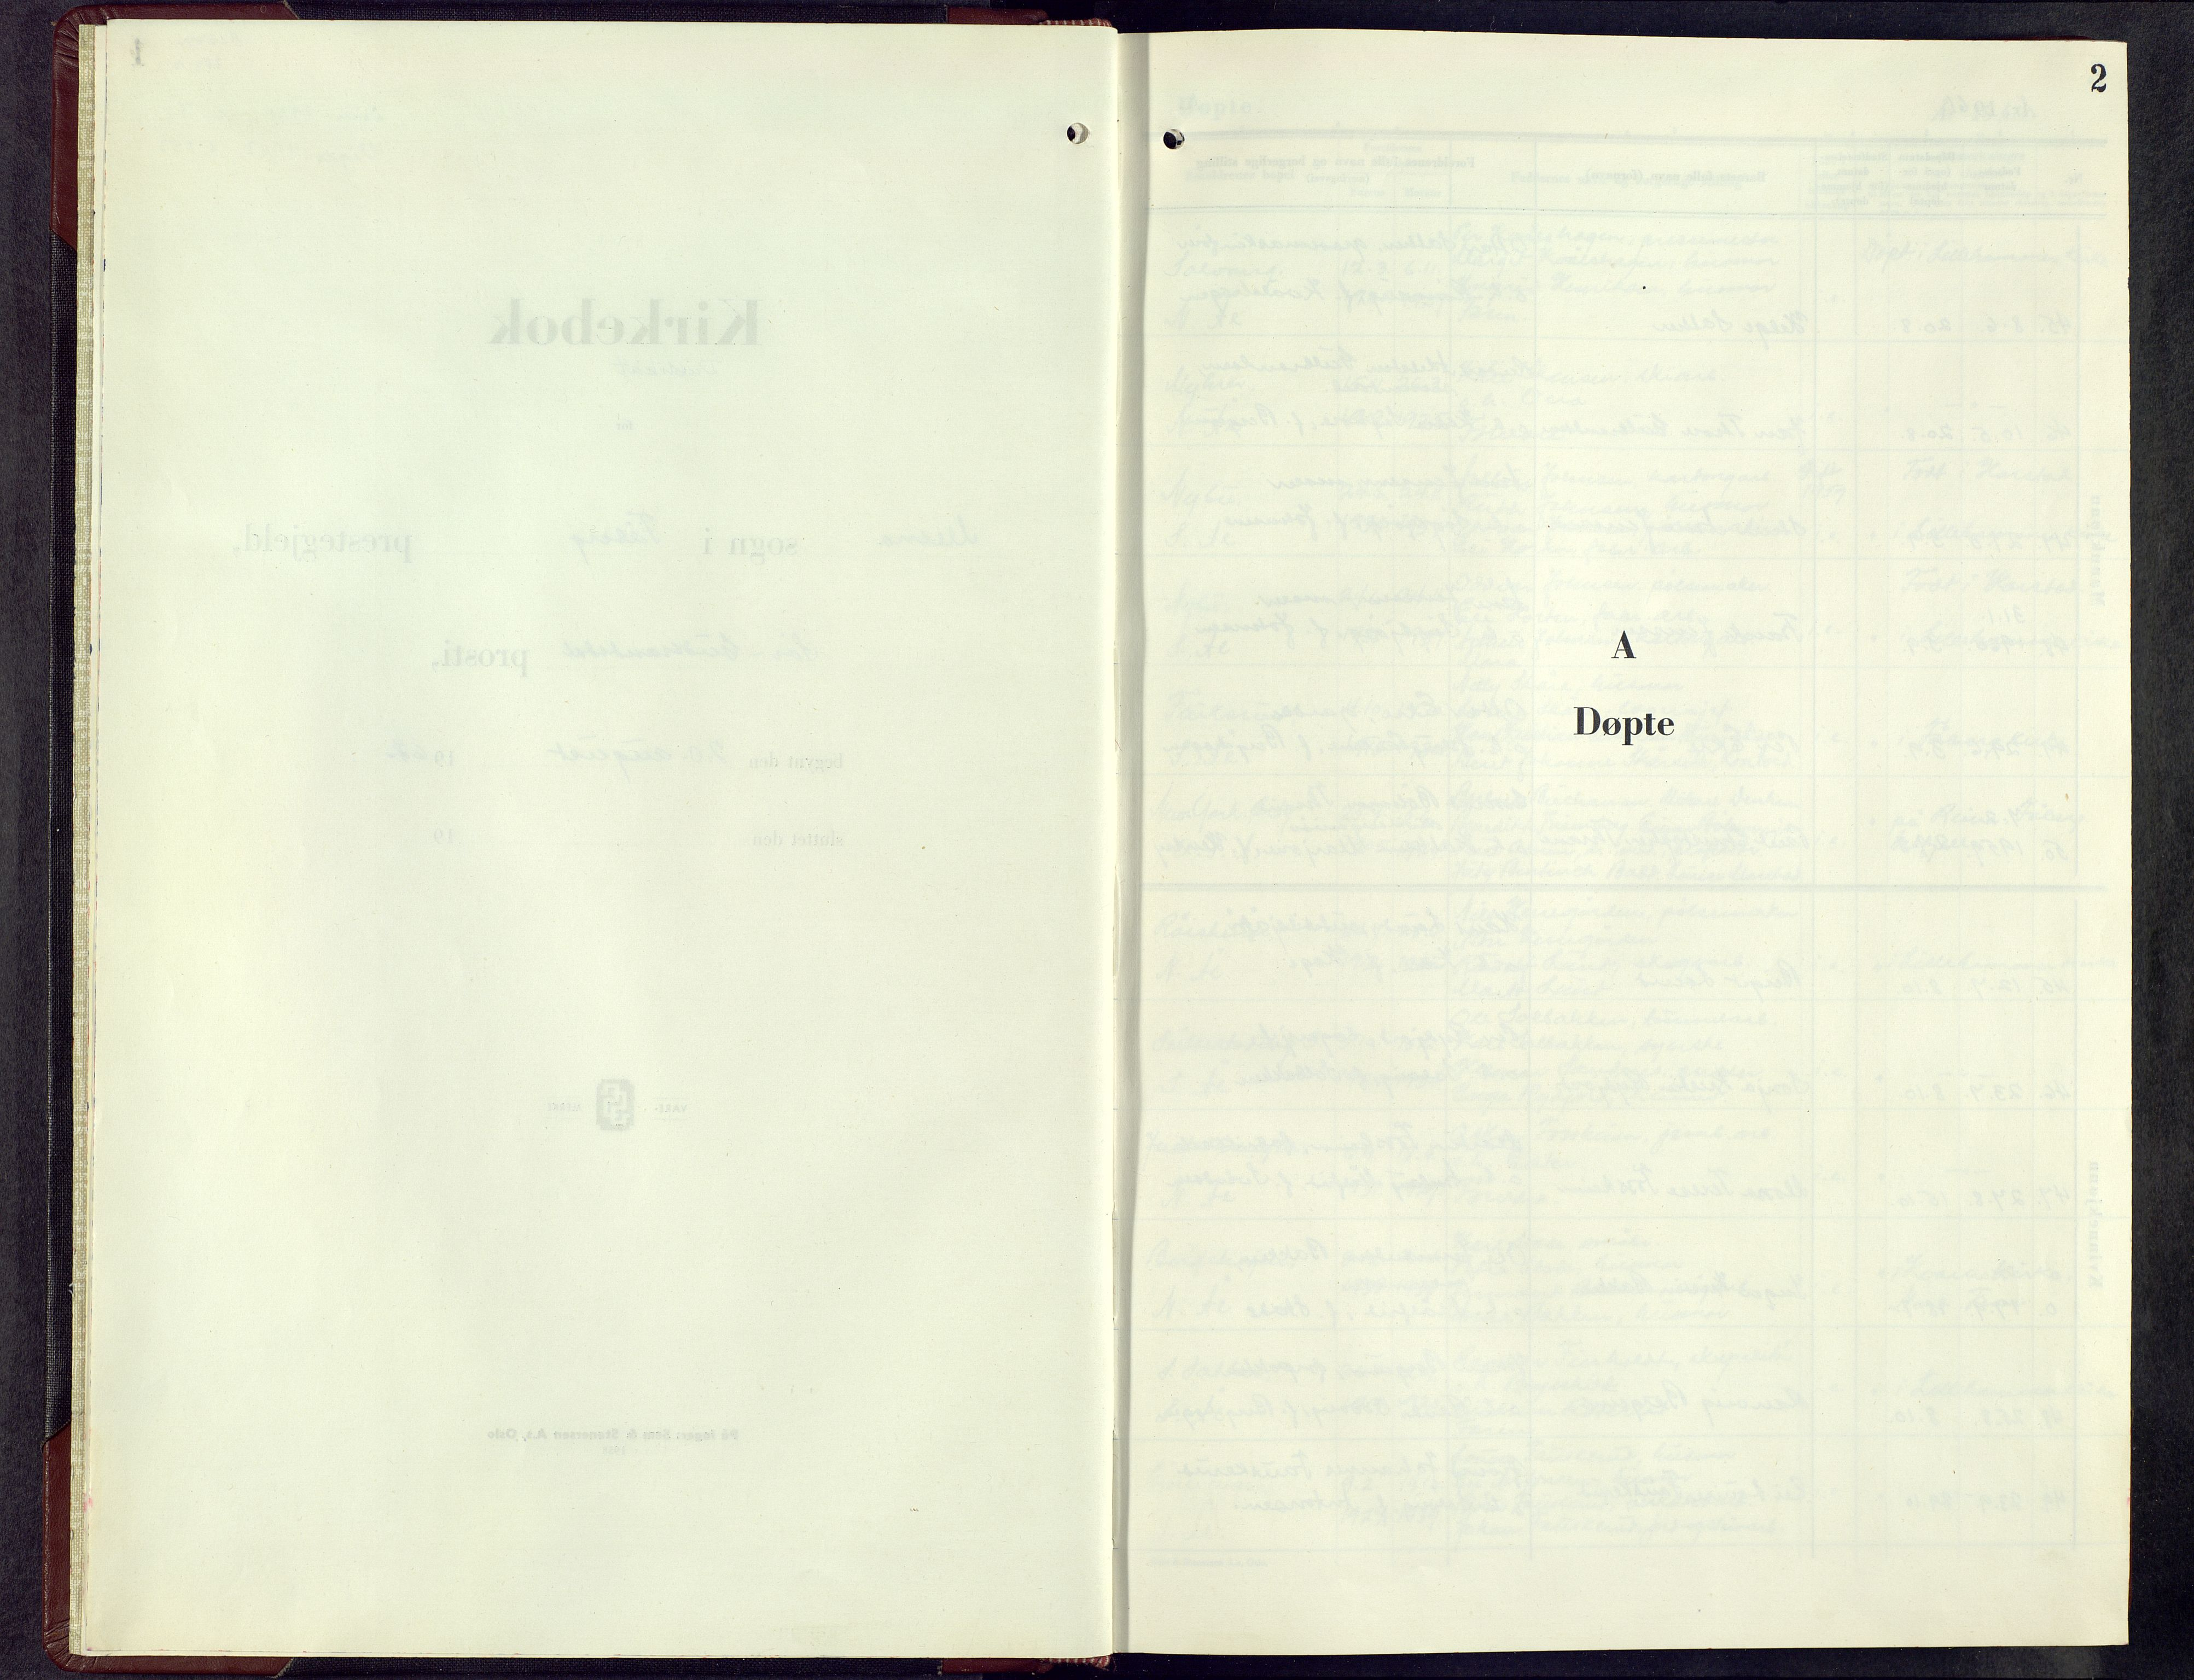 SAH, Fåberg prestekontor, H/Ha/Hab/L0020: Parish register (copy) no. 20, 1961-1968, p. 2